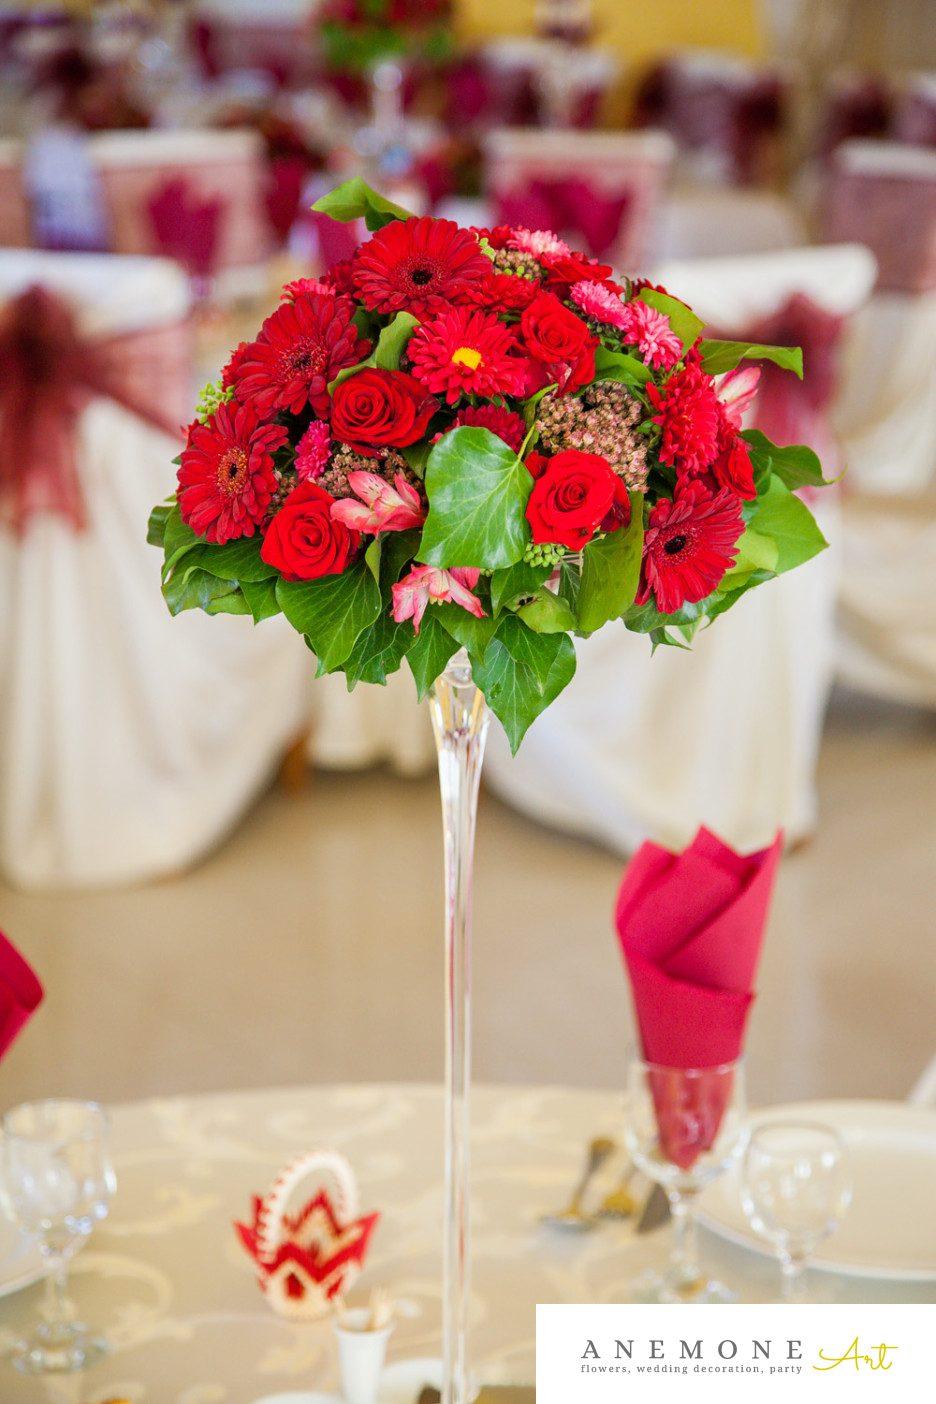 Poza, foto cu Flori de nunta decor masa, rosu, trandafiri in Arad, Timisoara, Oradea (wedding flowers, bouquets) nunta Arad, Timisoara, Oradea